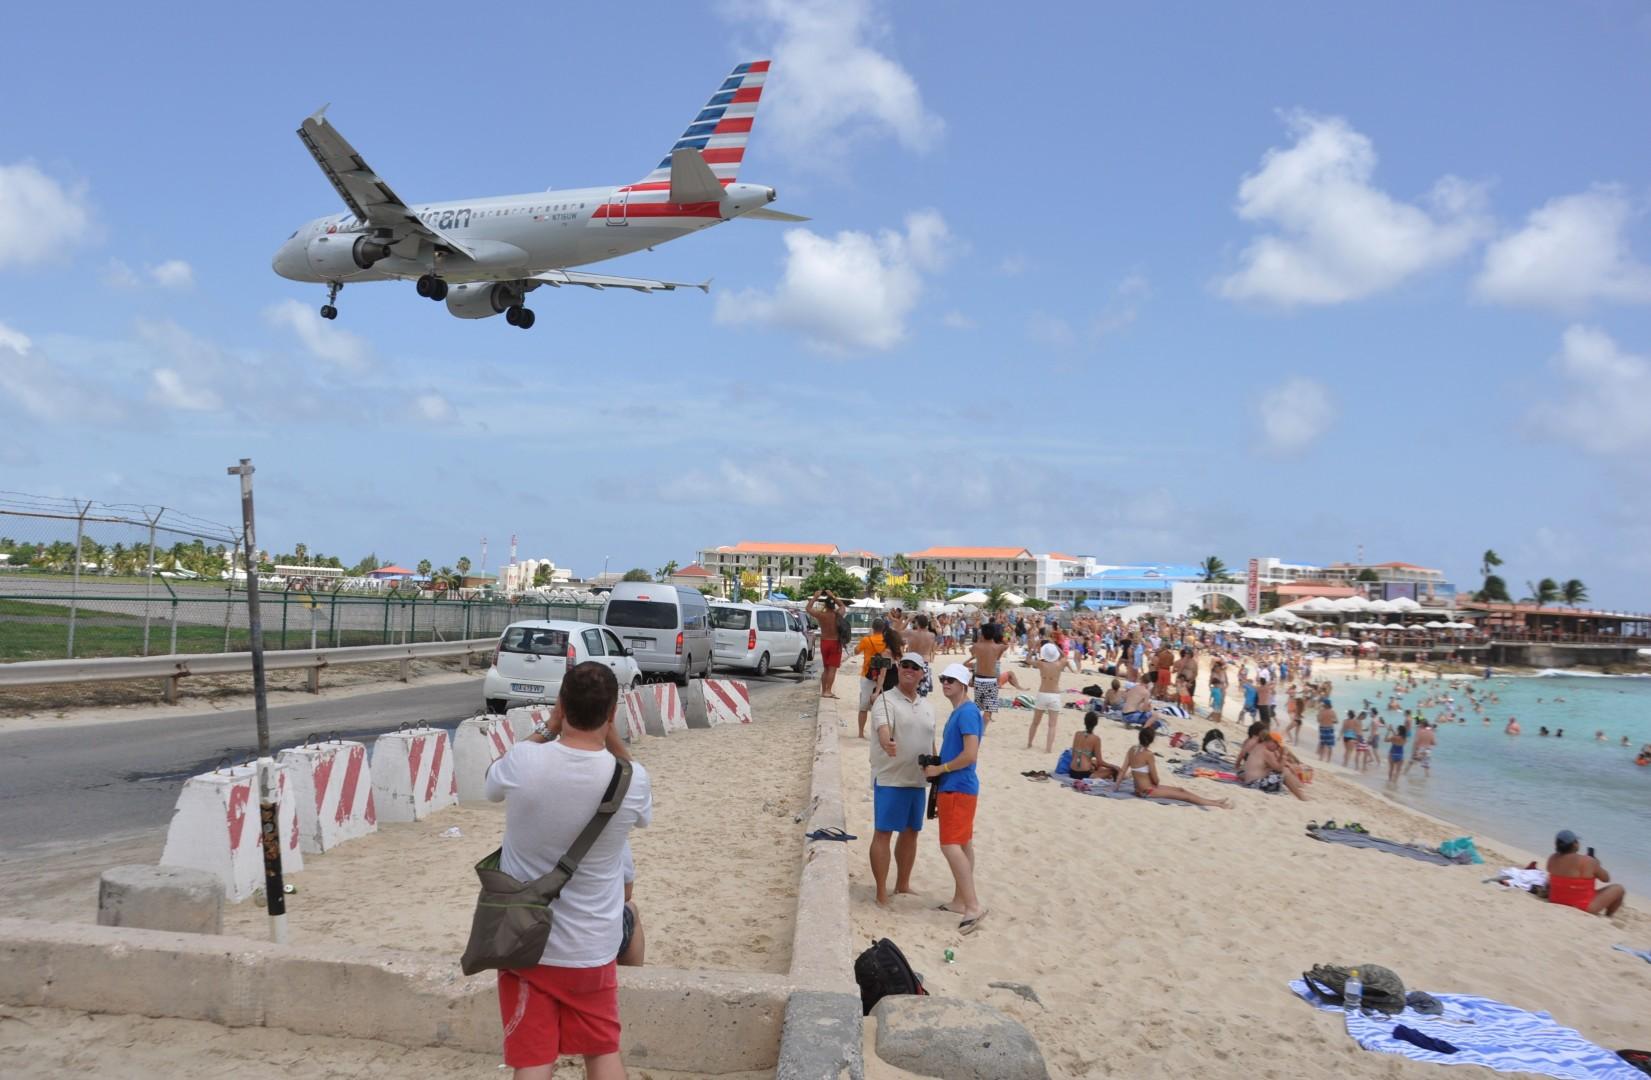 fa9750a440b4 Thrill-seeking tourist killed by jet-engine blast at Caribbean beach  airport   South China Morning Post